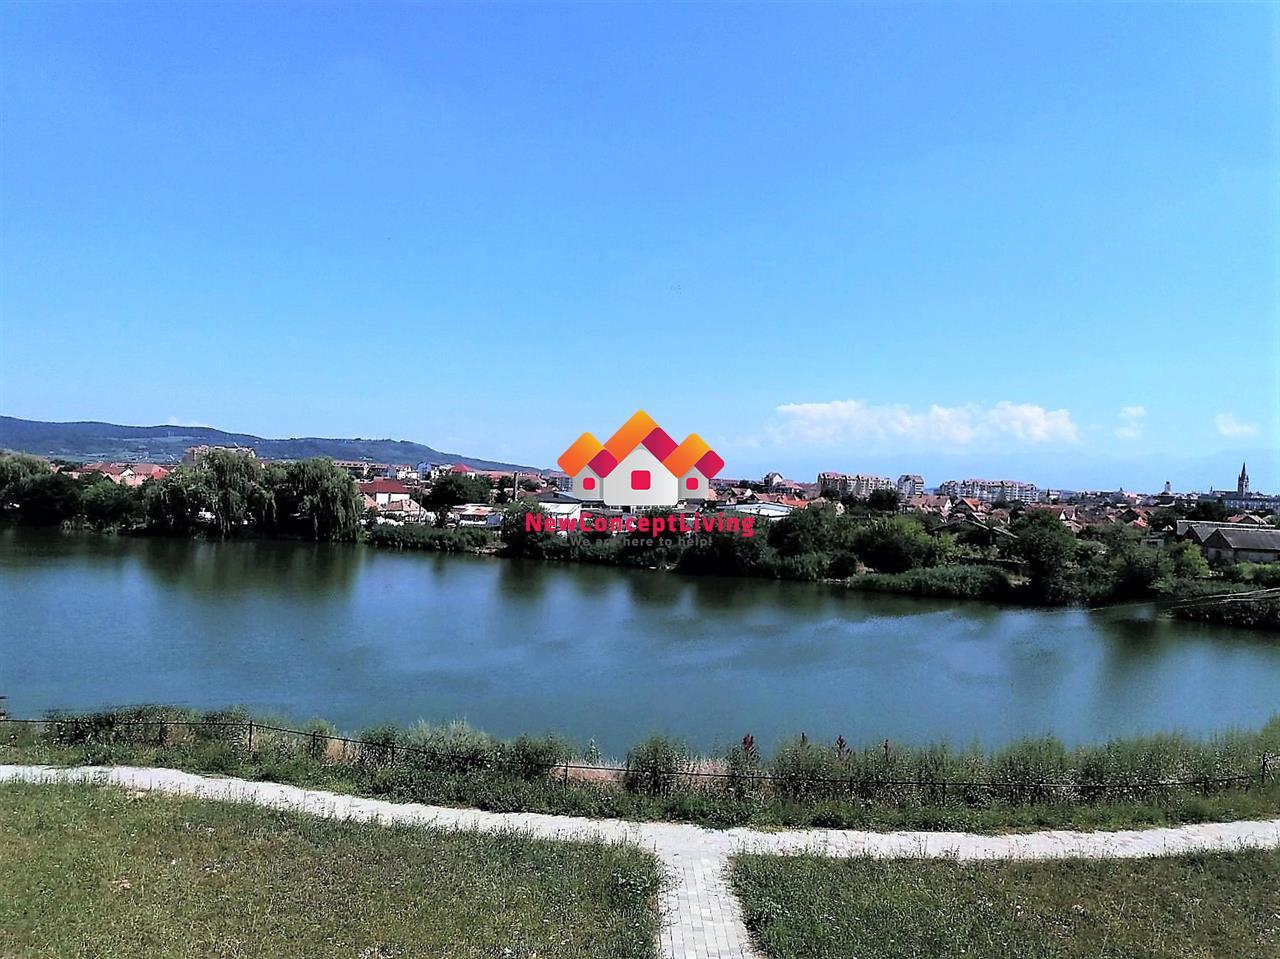 Apartament de vanzare Sibiu – 2 camere – Locatie superba si linistita